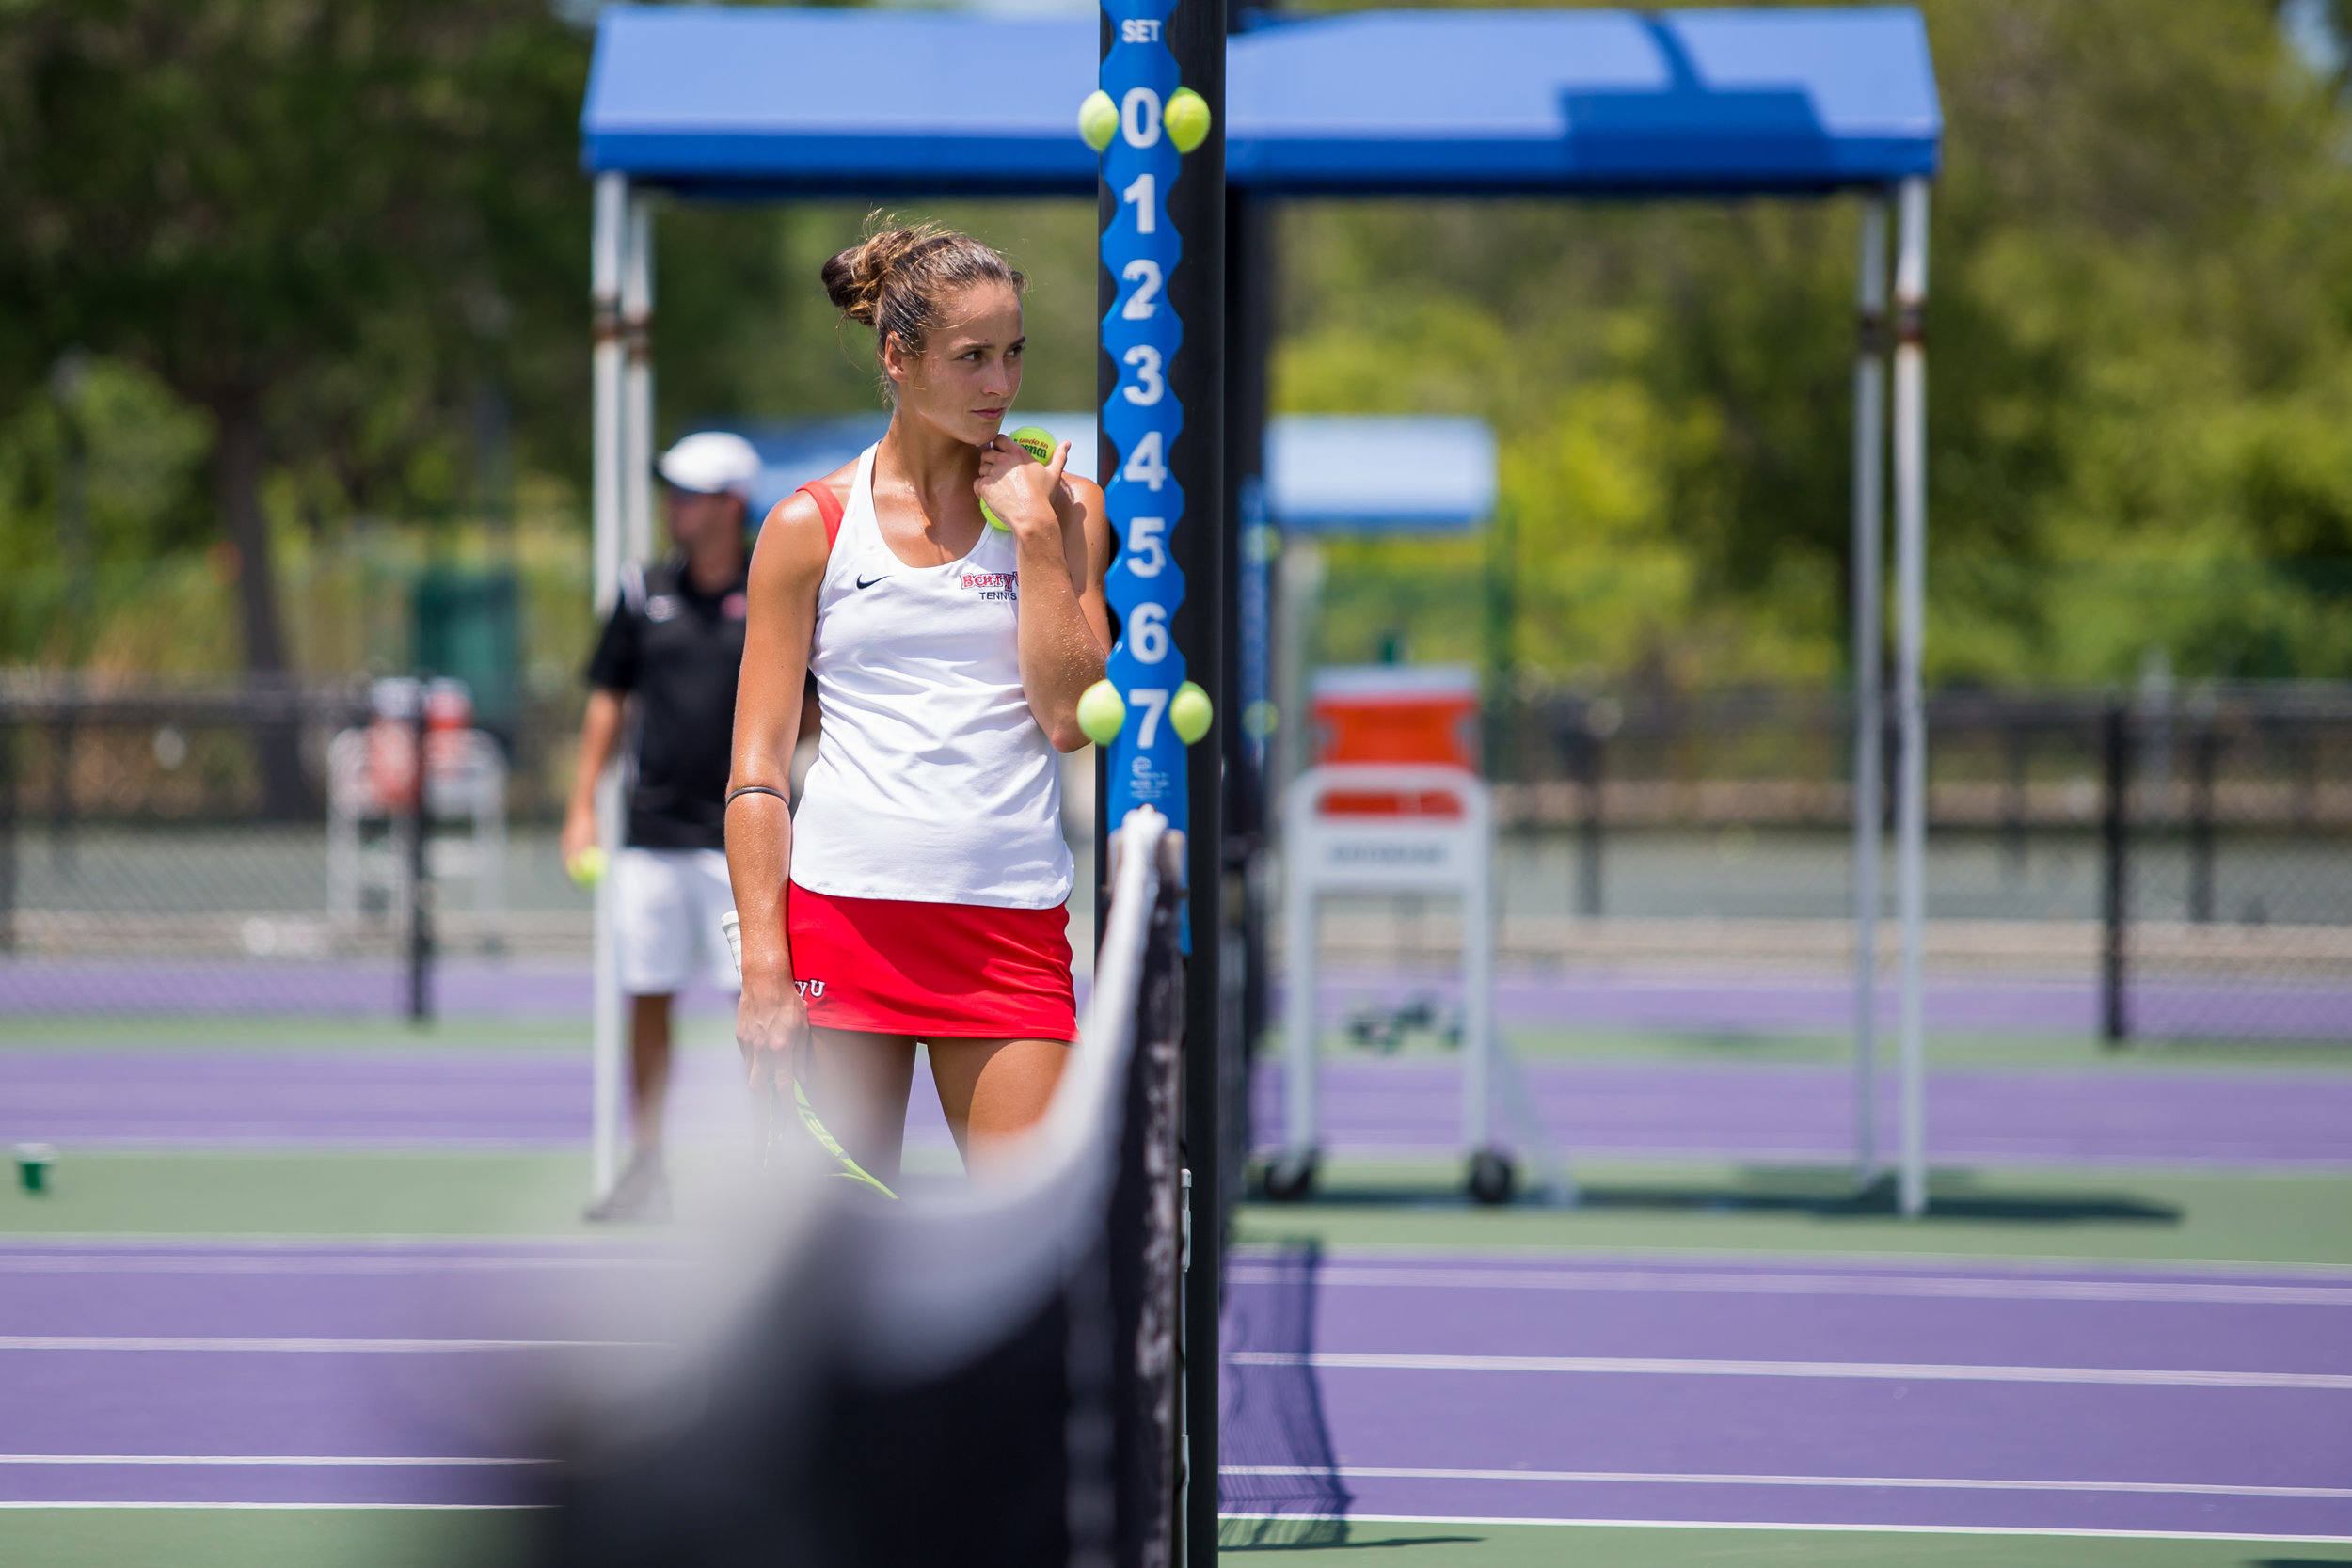 4-28-19 - SSC Tennis Championships - Holt -21.jpg